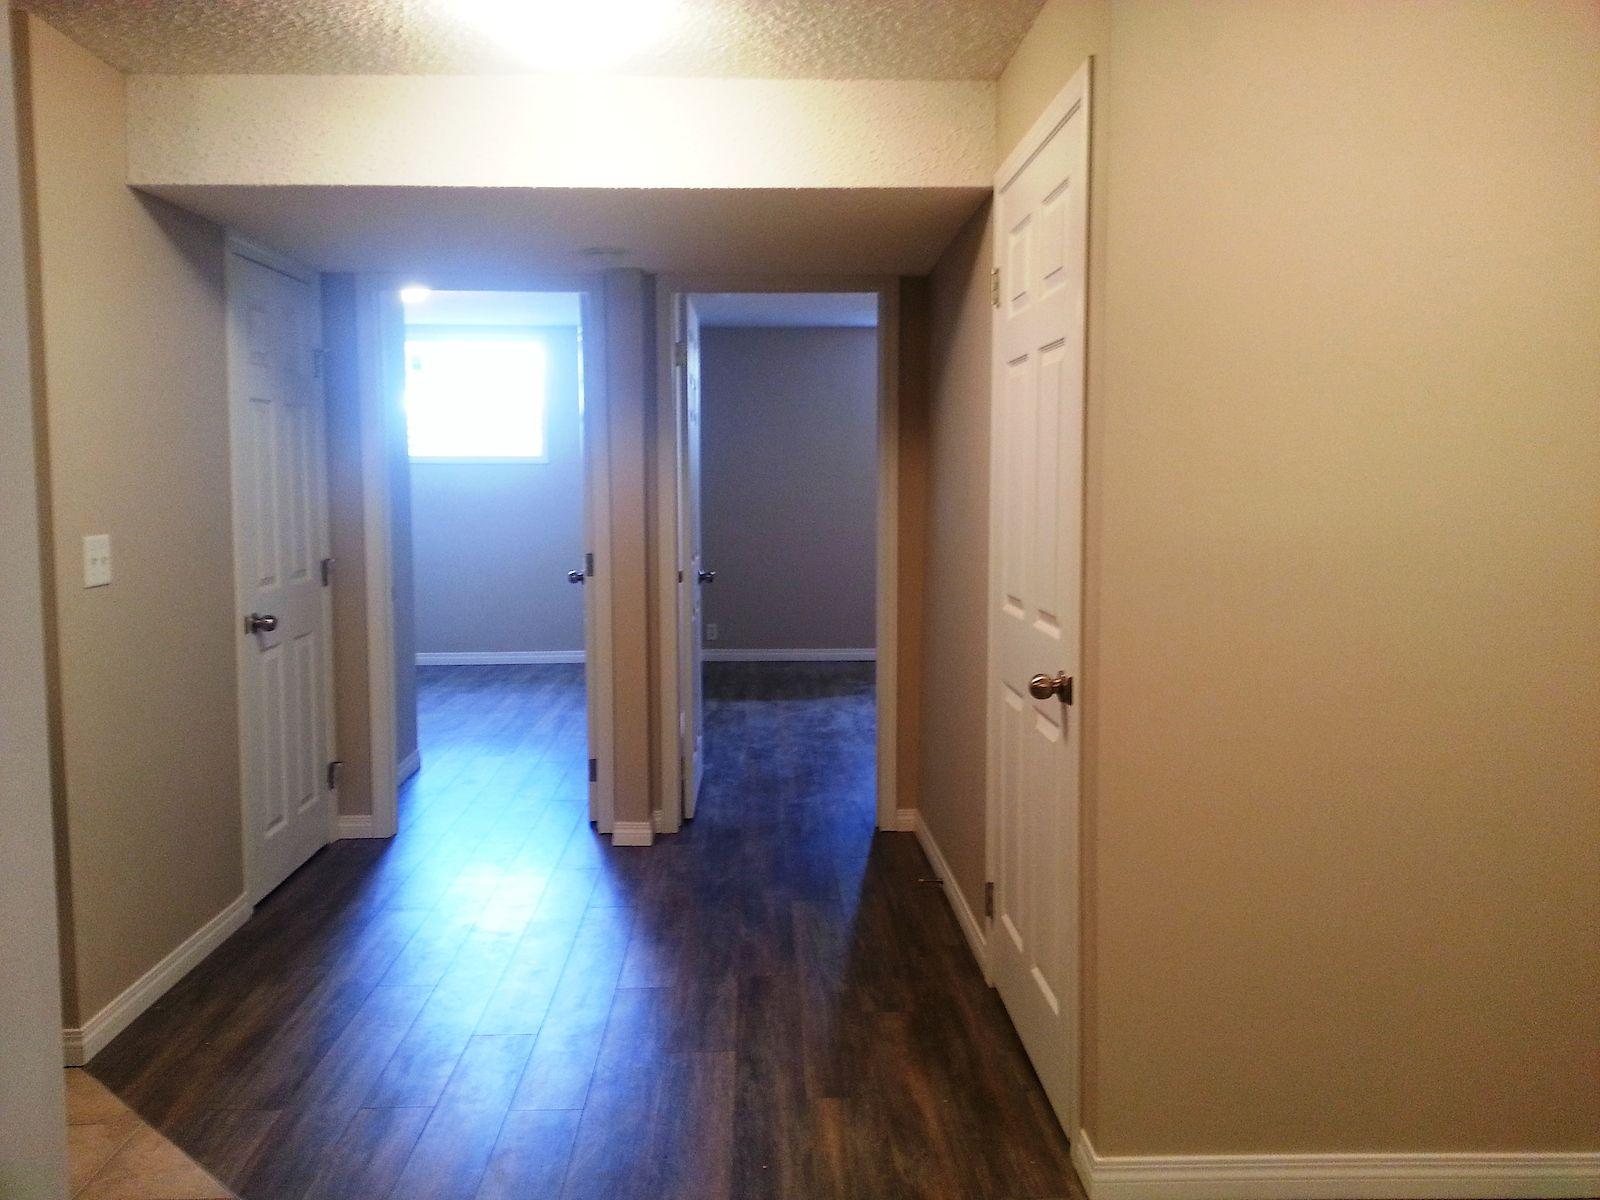 2 Bedroom Basement For Rent Calgary